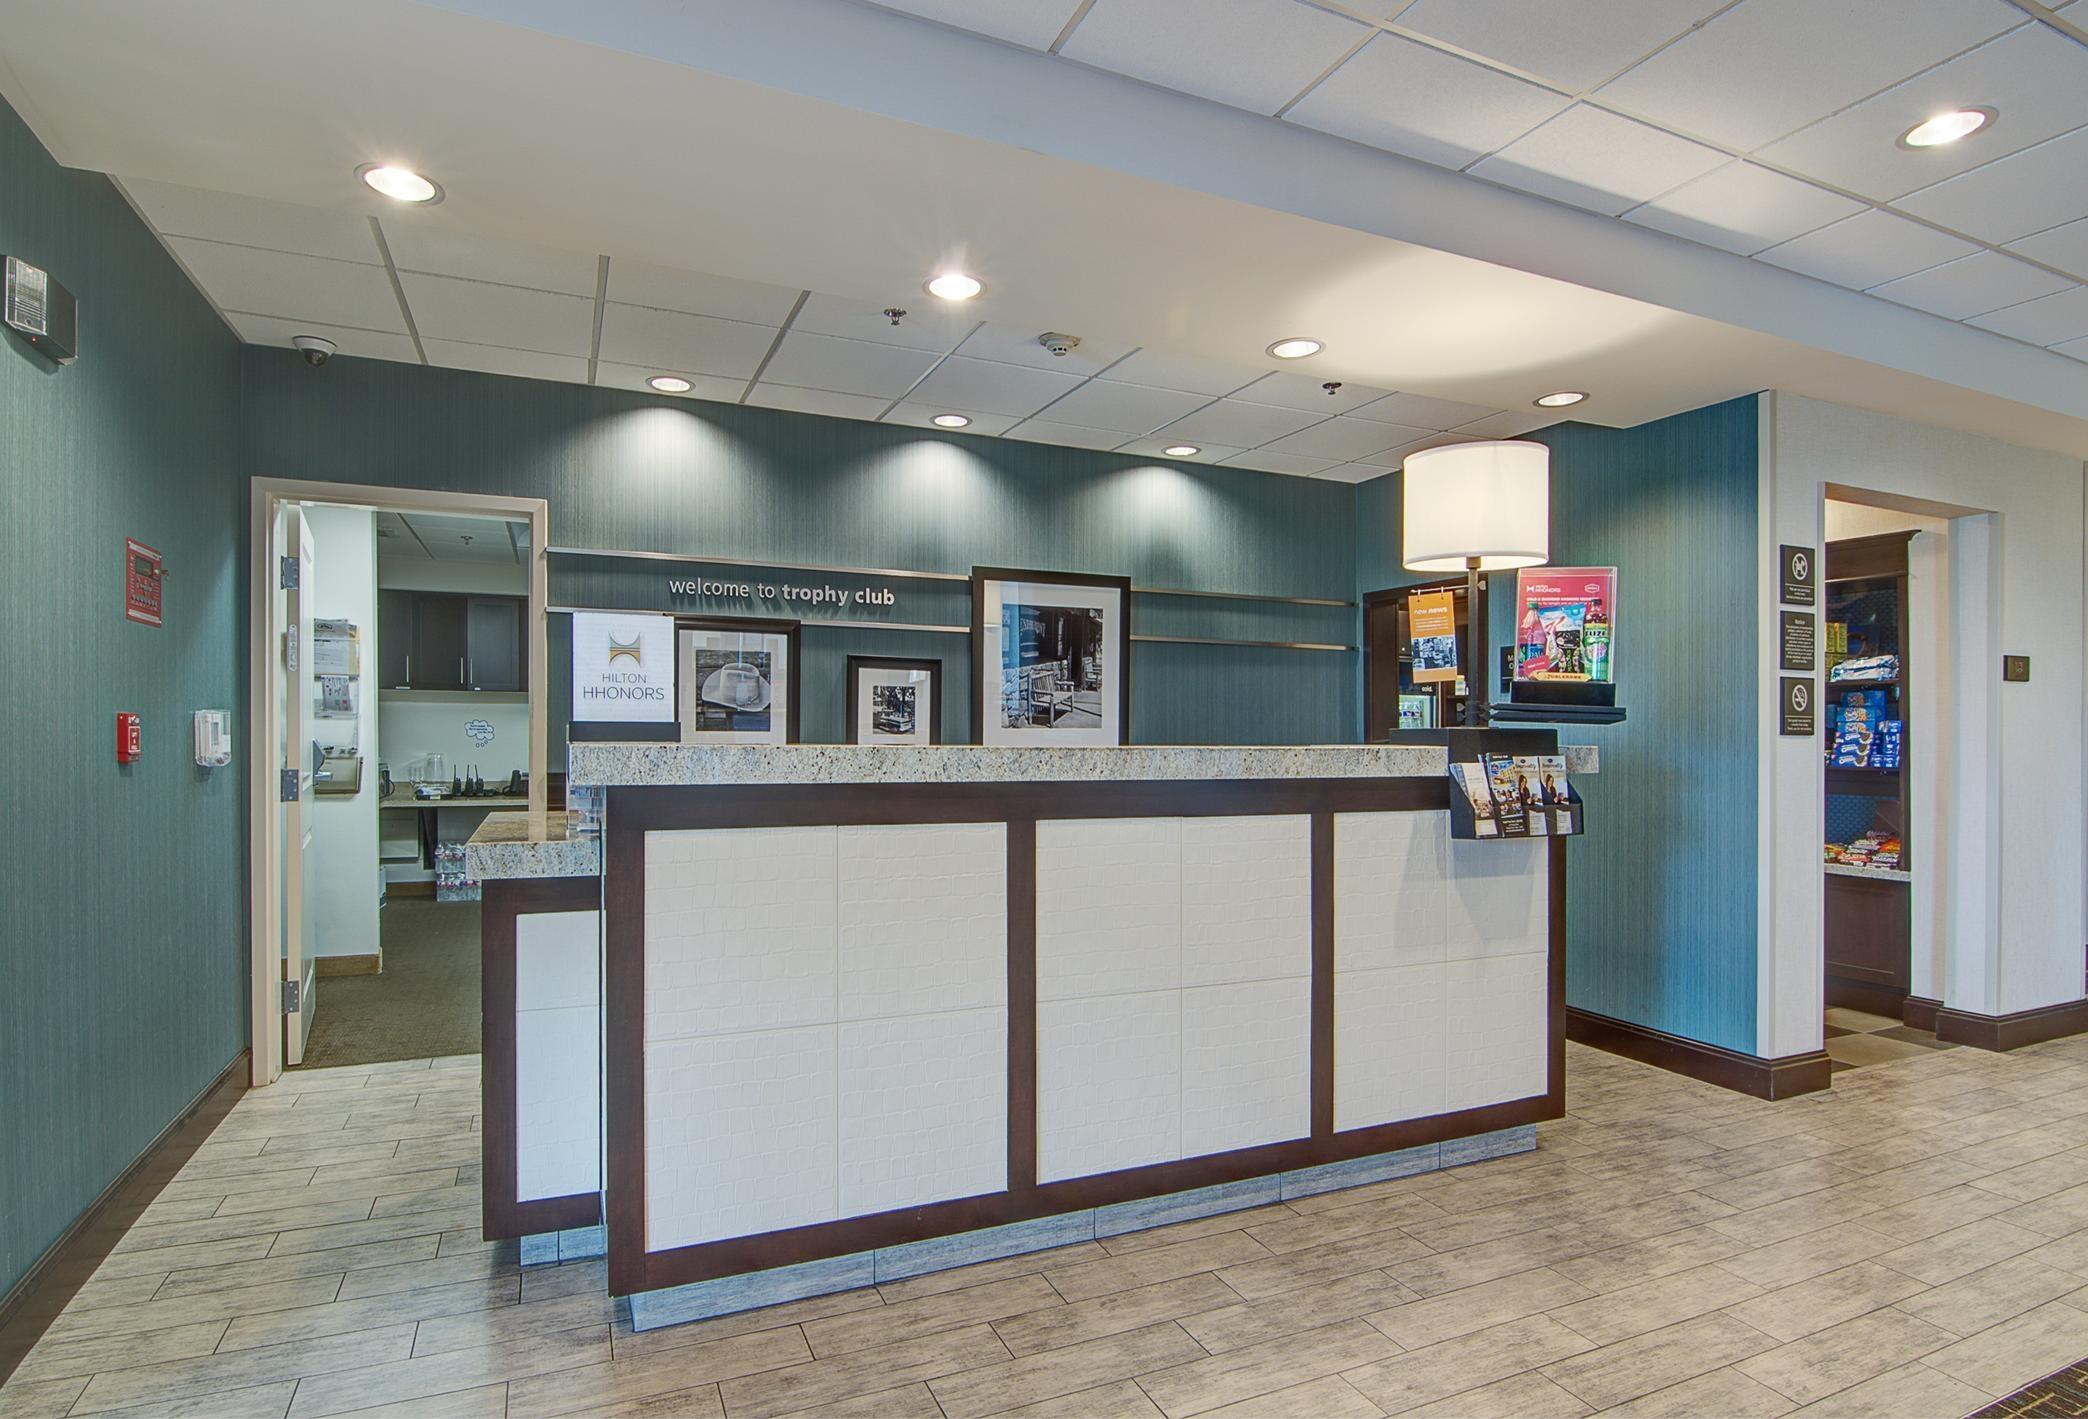 Hampton Inn & Suites Trophy Club - Fort Worth North image 2